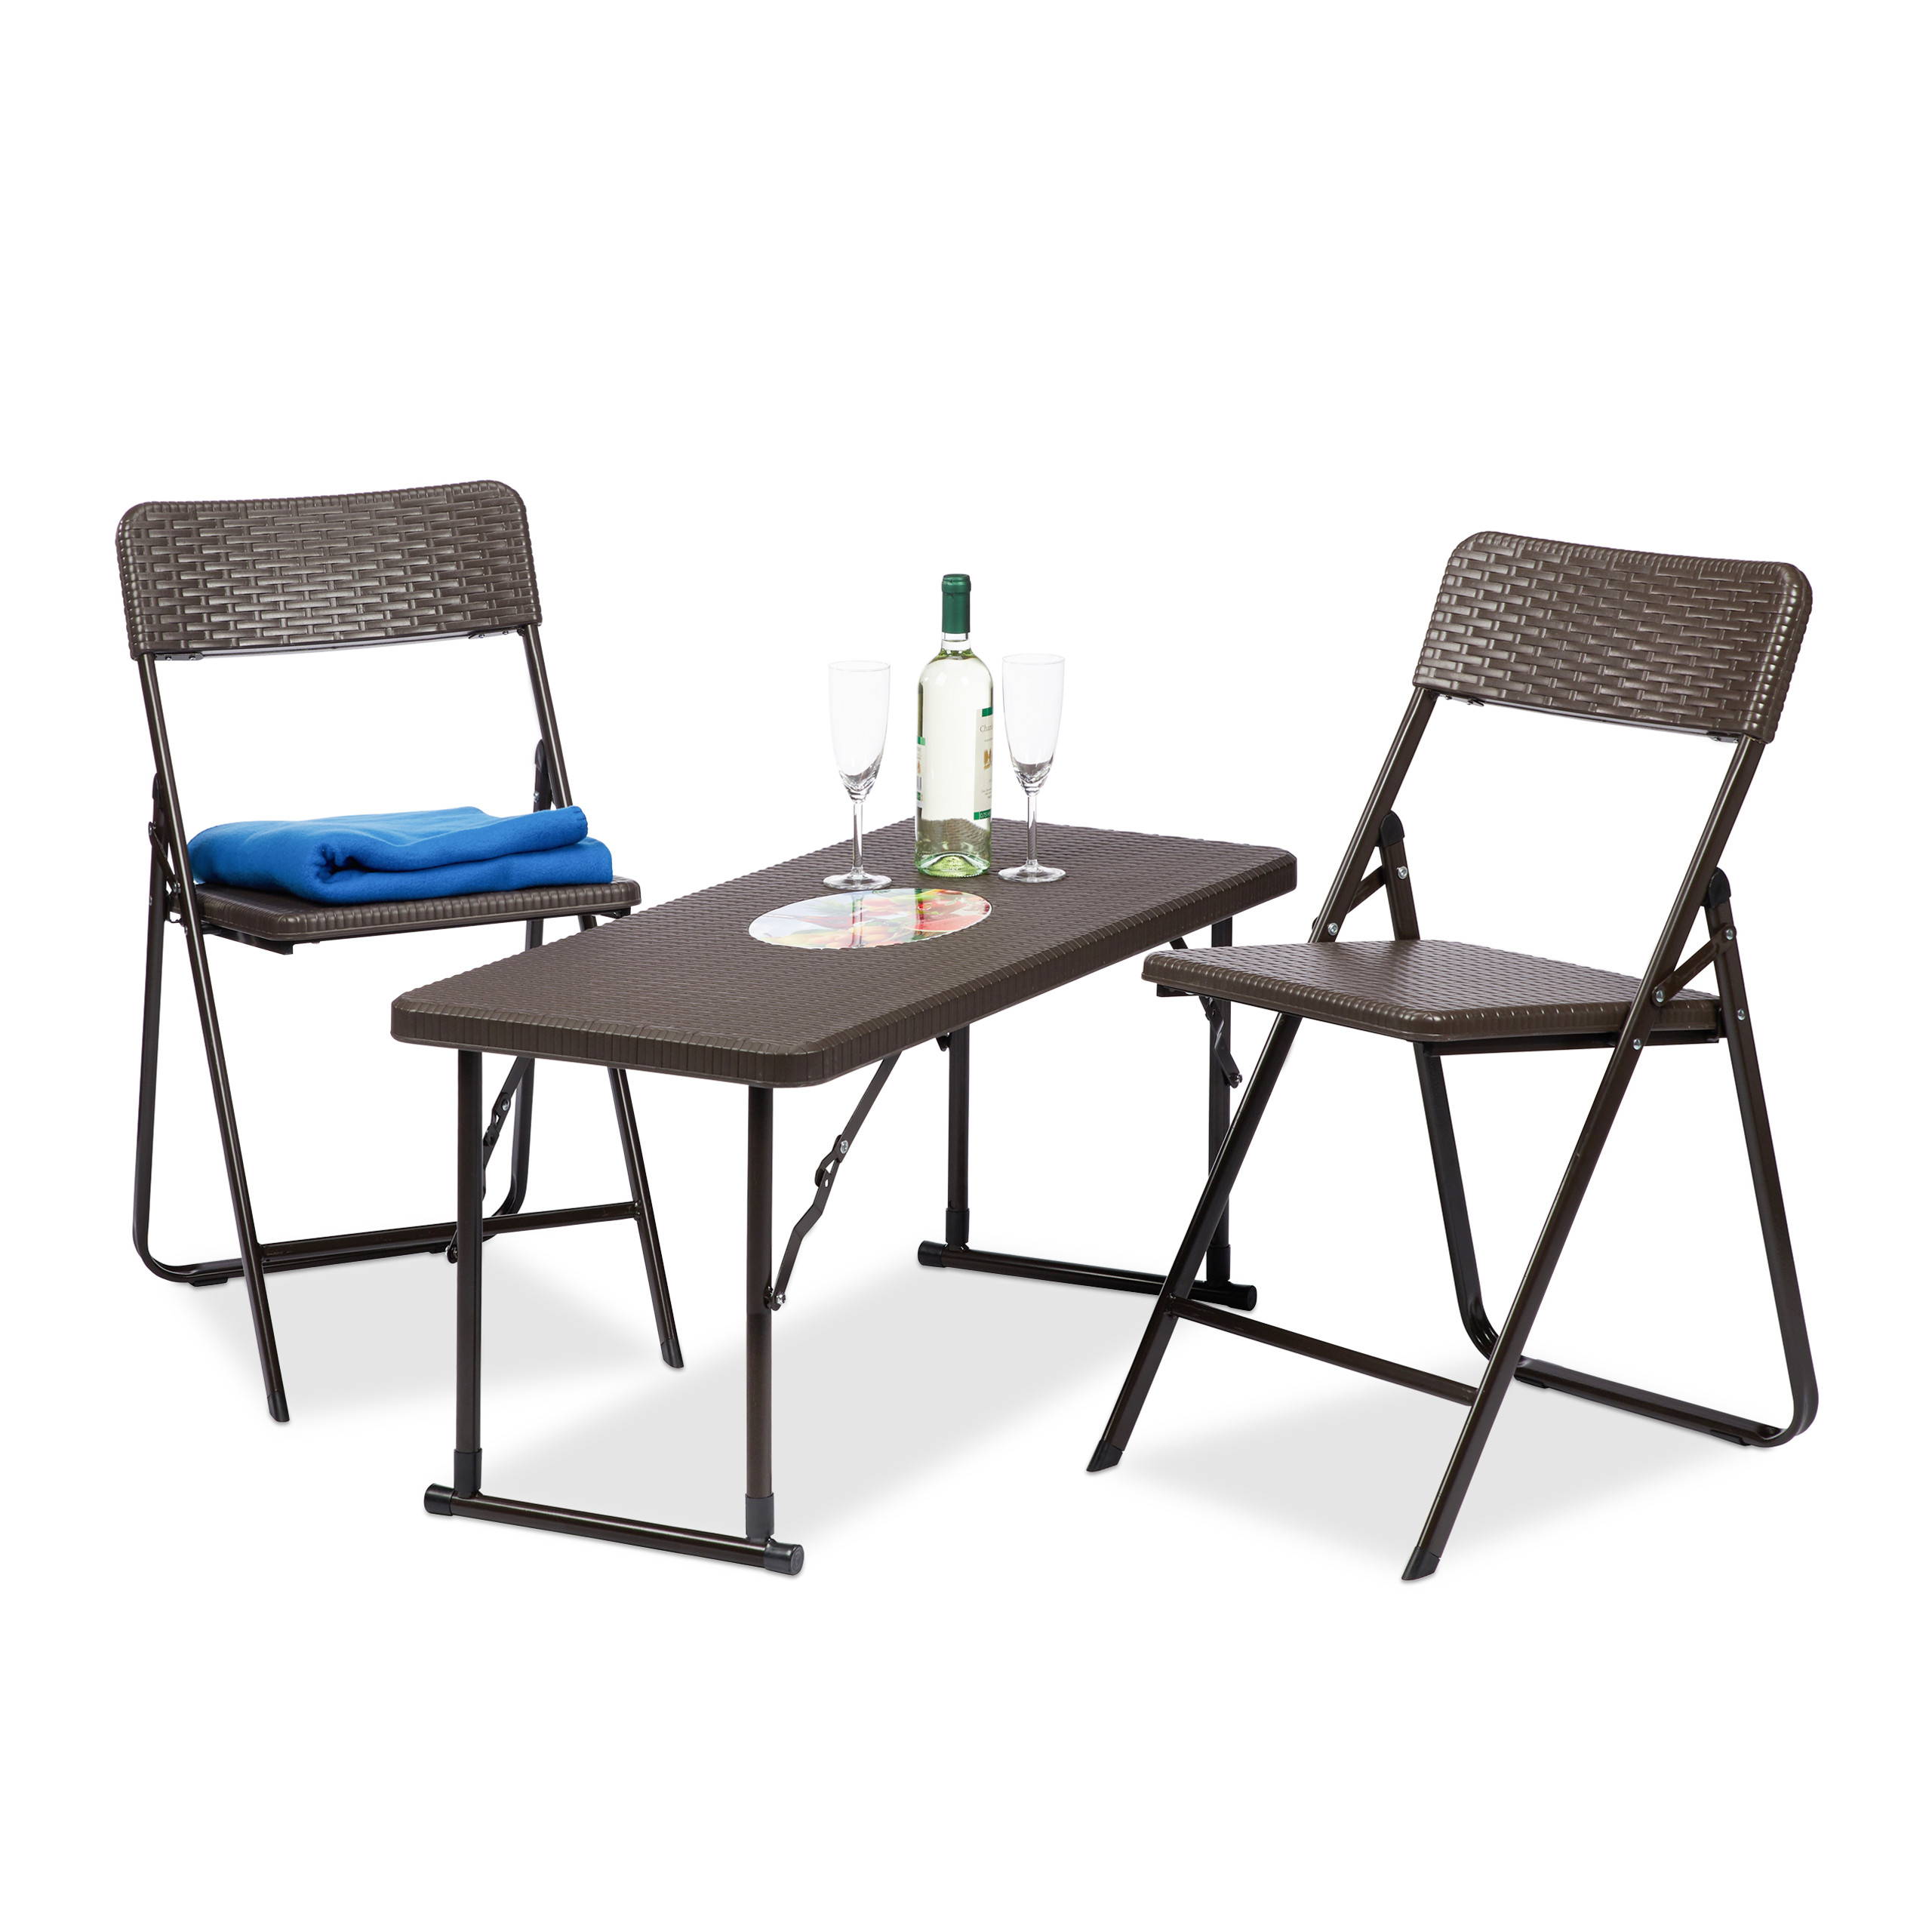 Meubles de Jardin Set 3x Groupe Balcon Camping Garniture Pliante ...